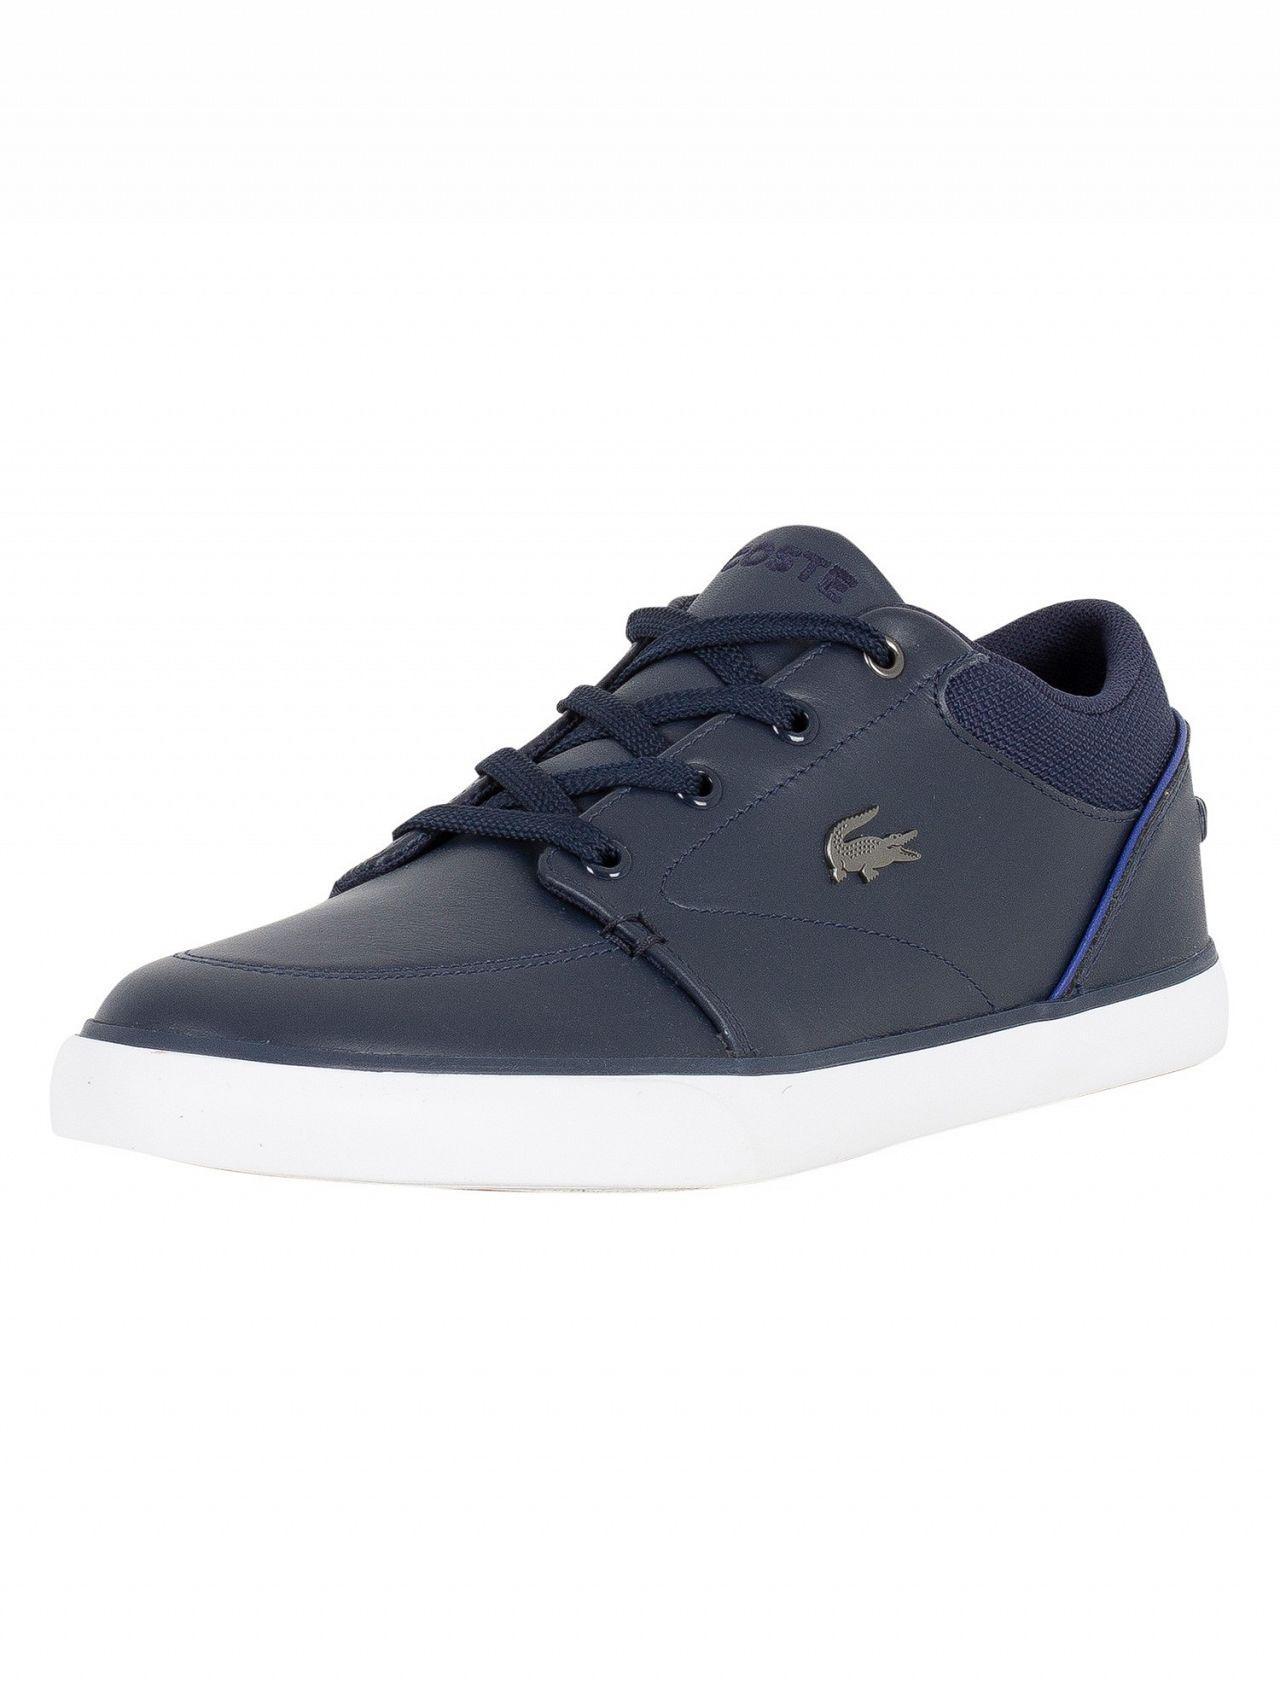 Lacoste Herren Bayliss 318 2 Cam Sneaker